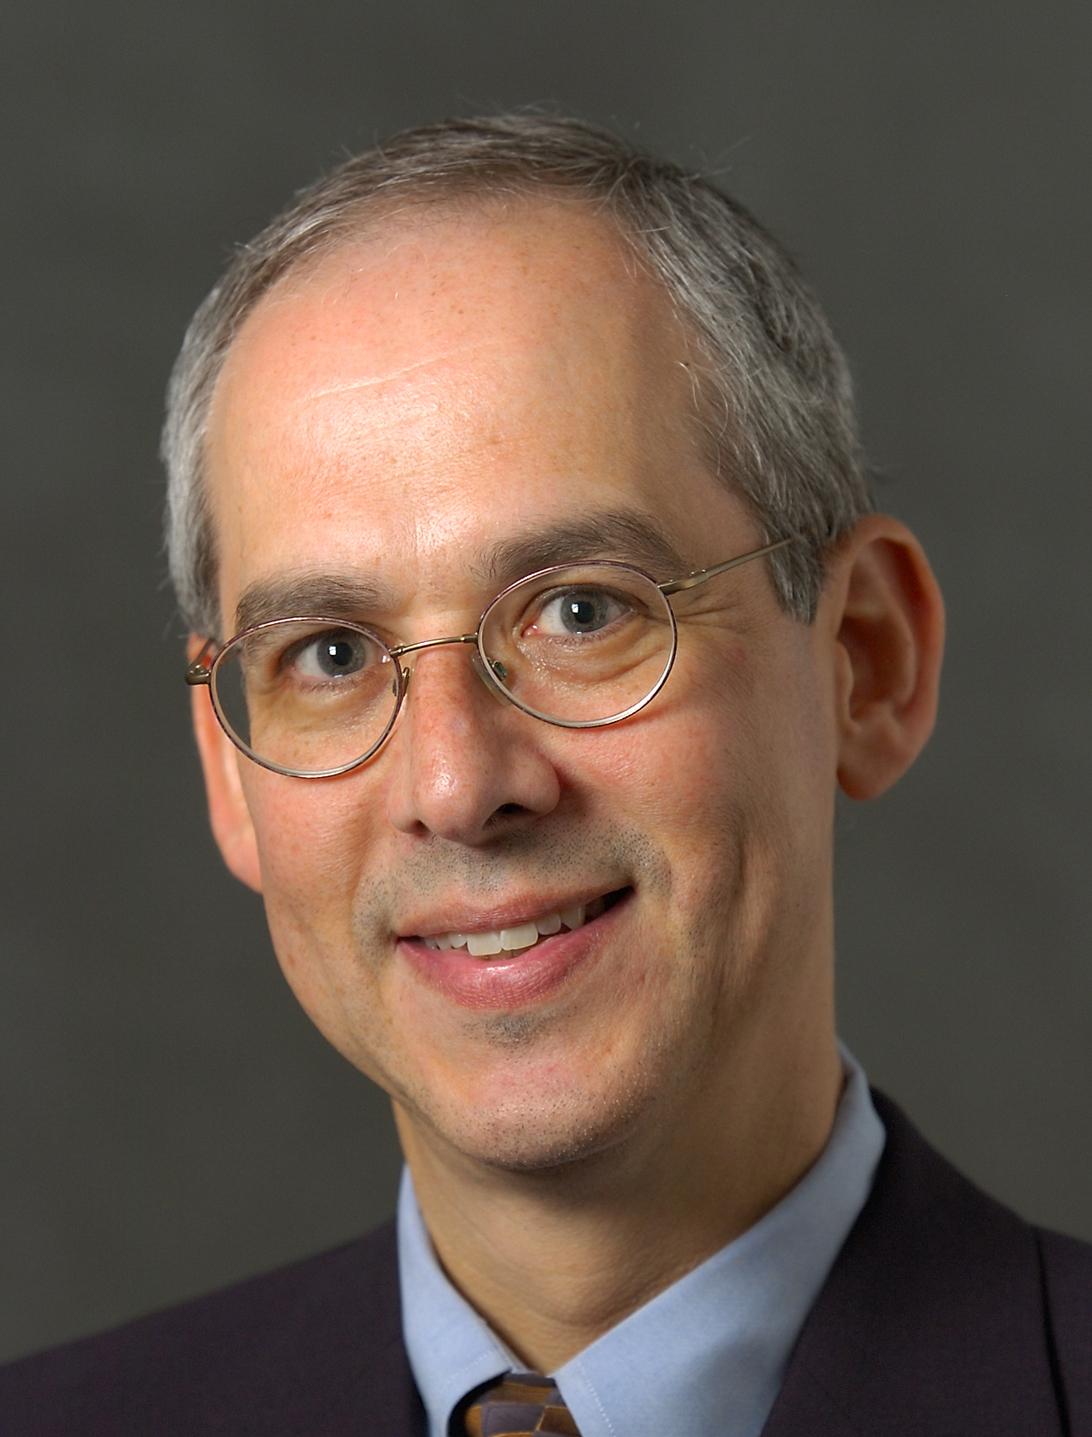 Robert Kotloff, M.D. '83, named chair at Cleveland Clinic ...